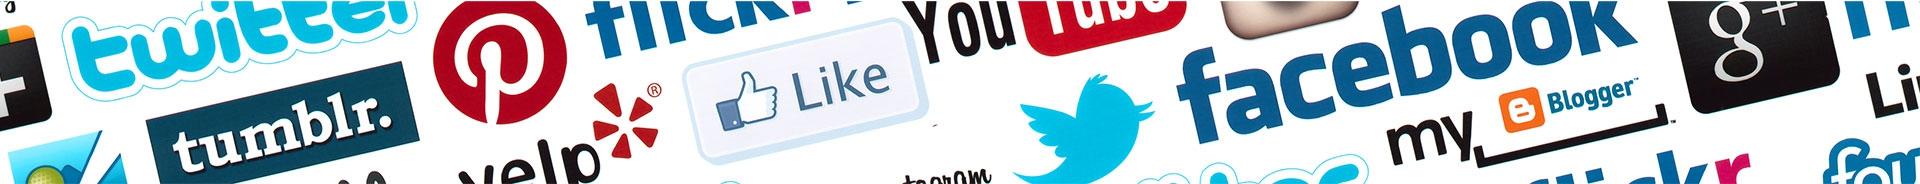 DAFNAE sui social networks